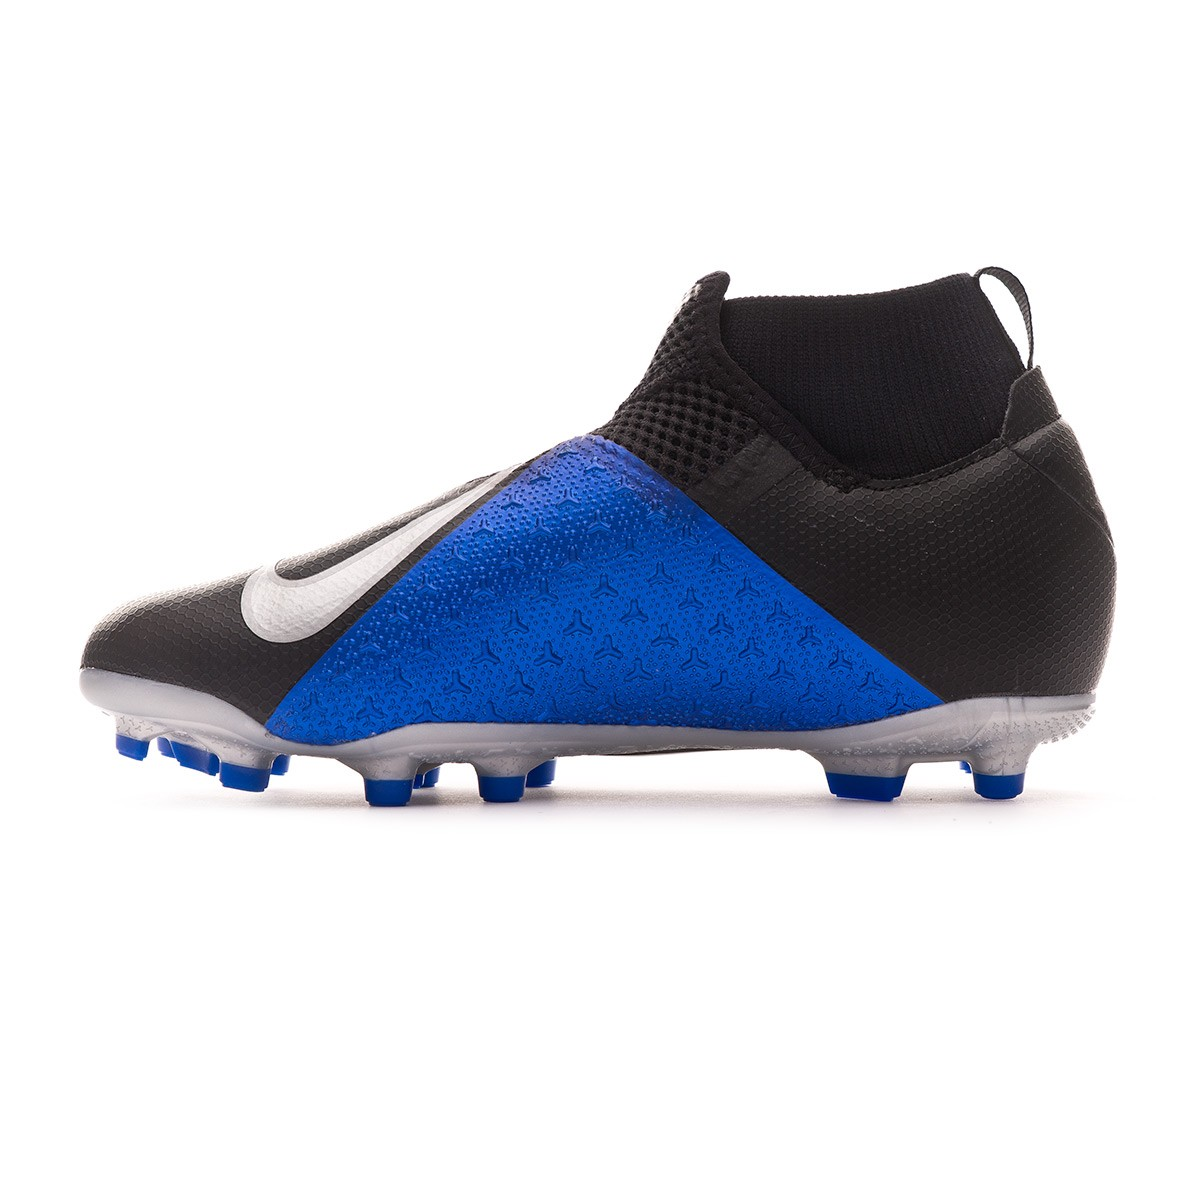 6c3d3ead302 Bota de fútbol Nike Phantom Vision Academy DF FG/MG Niño Black-Metallic  silver-Racer blue - Tienda de fútbol Fútbol Emotion